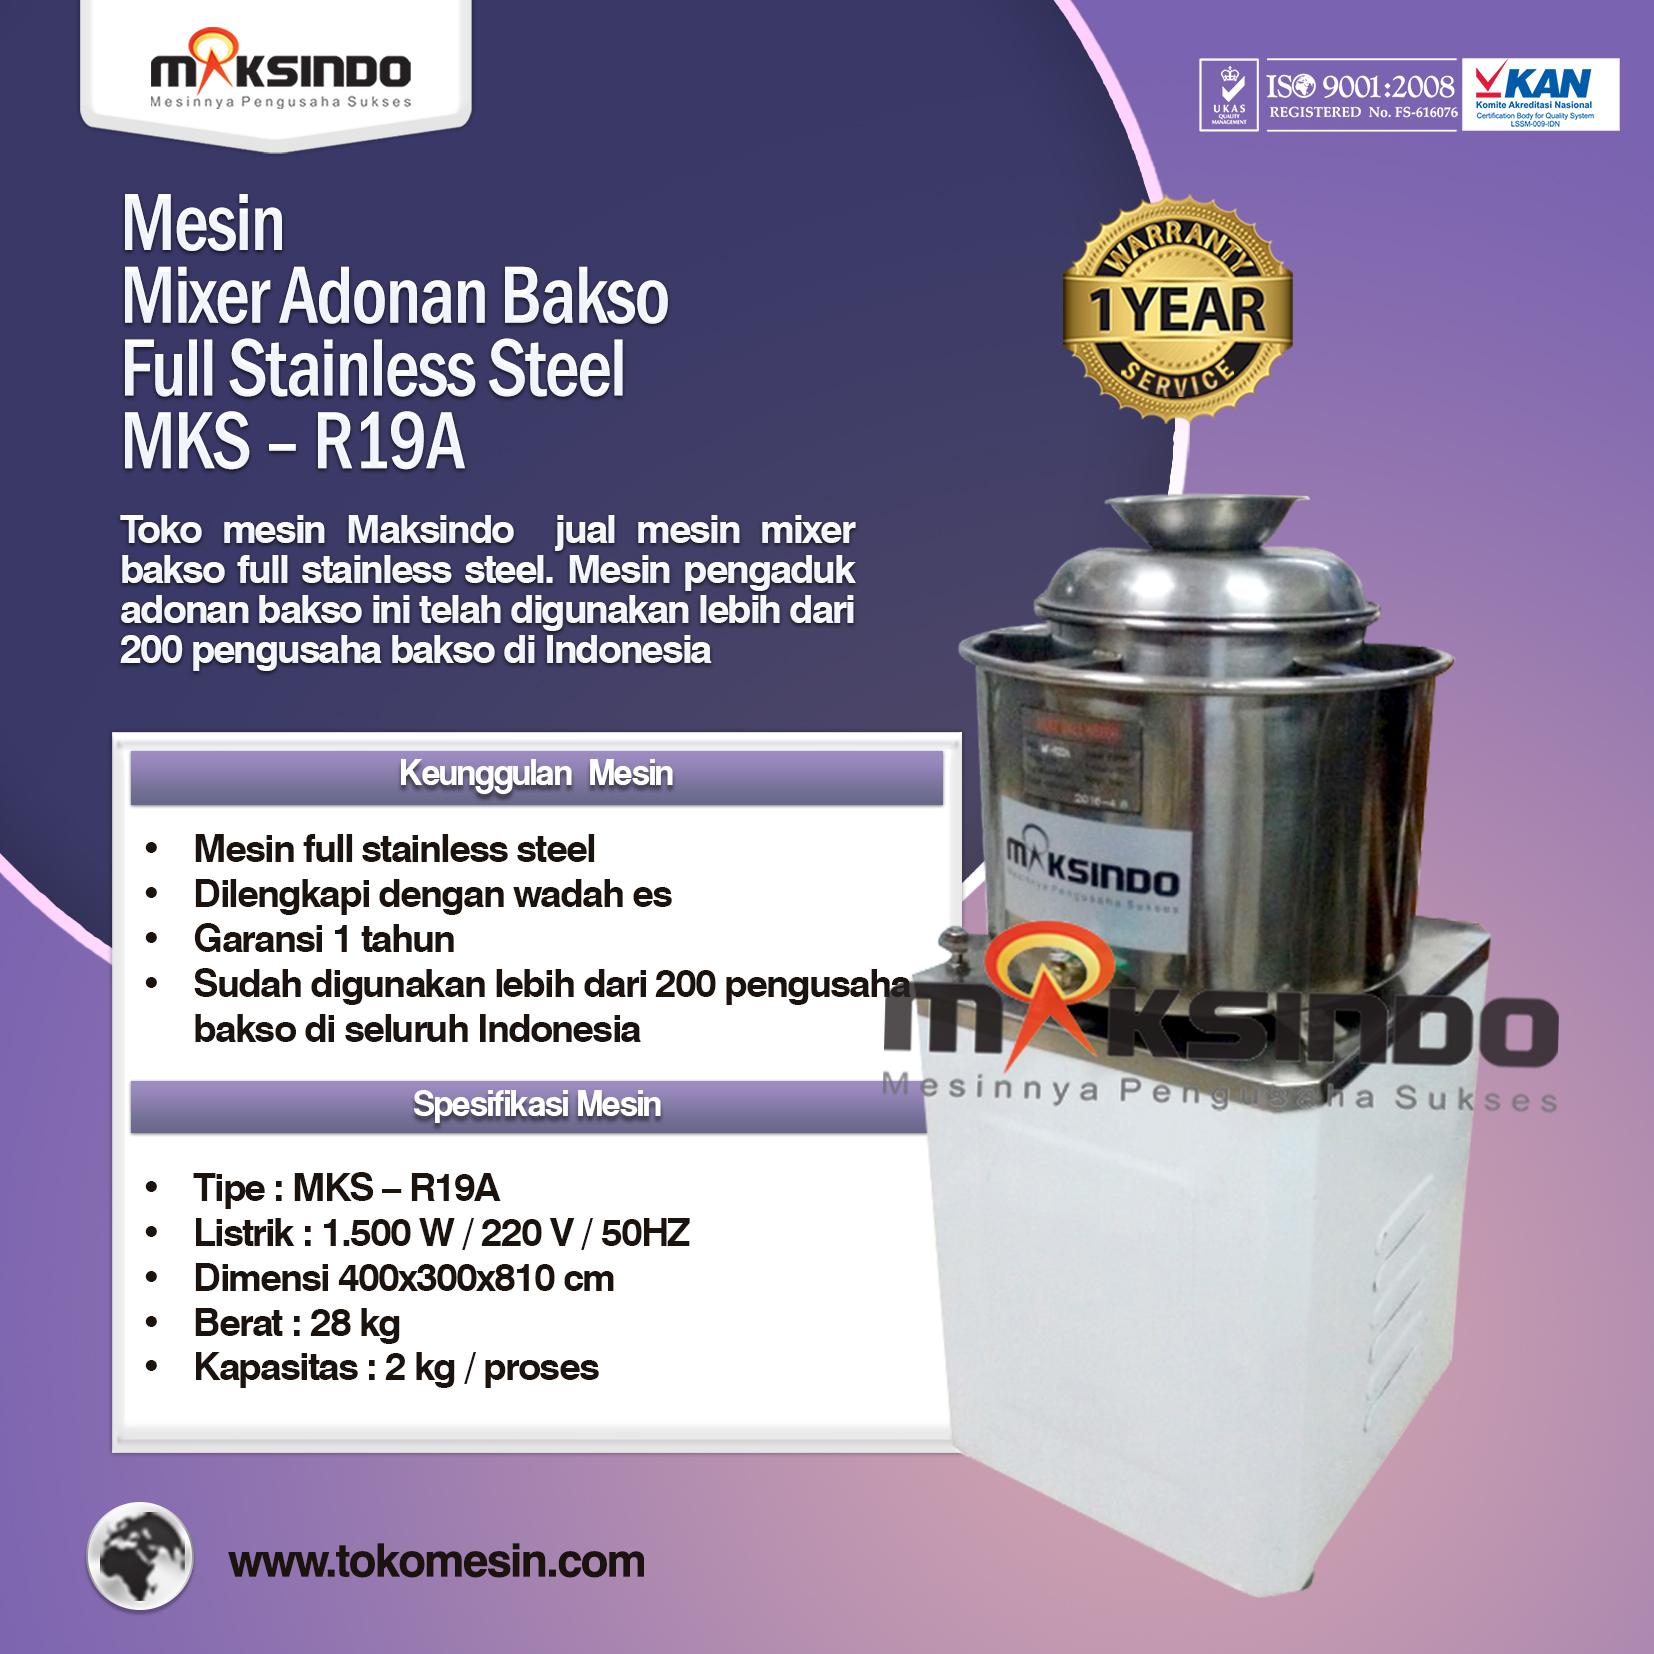 Mesin Mixer Adonan Bakso Full Stainless Steel MKS – R19A